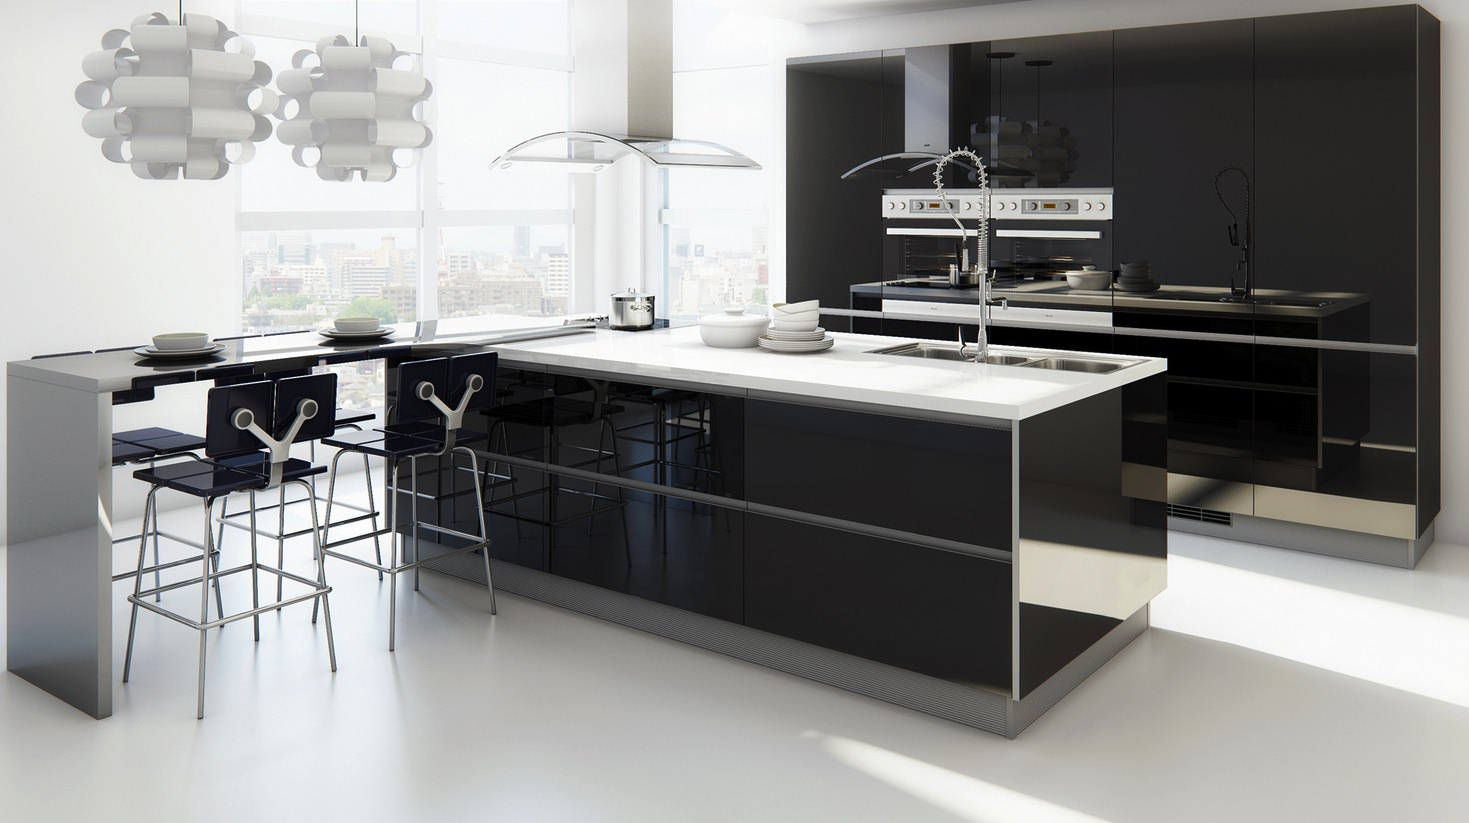 small island comtemporary kitchen design